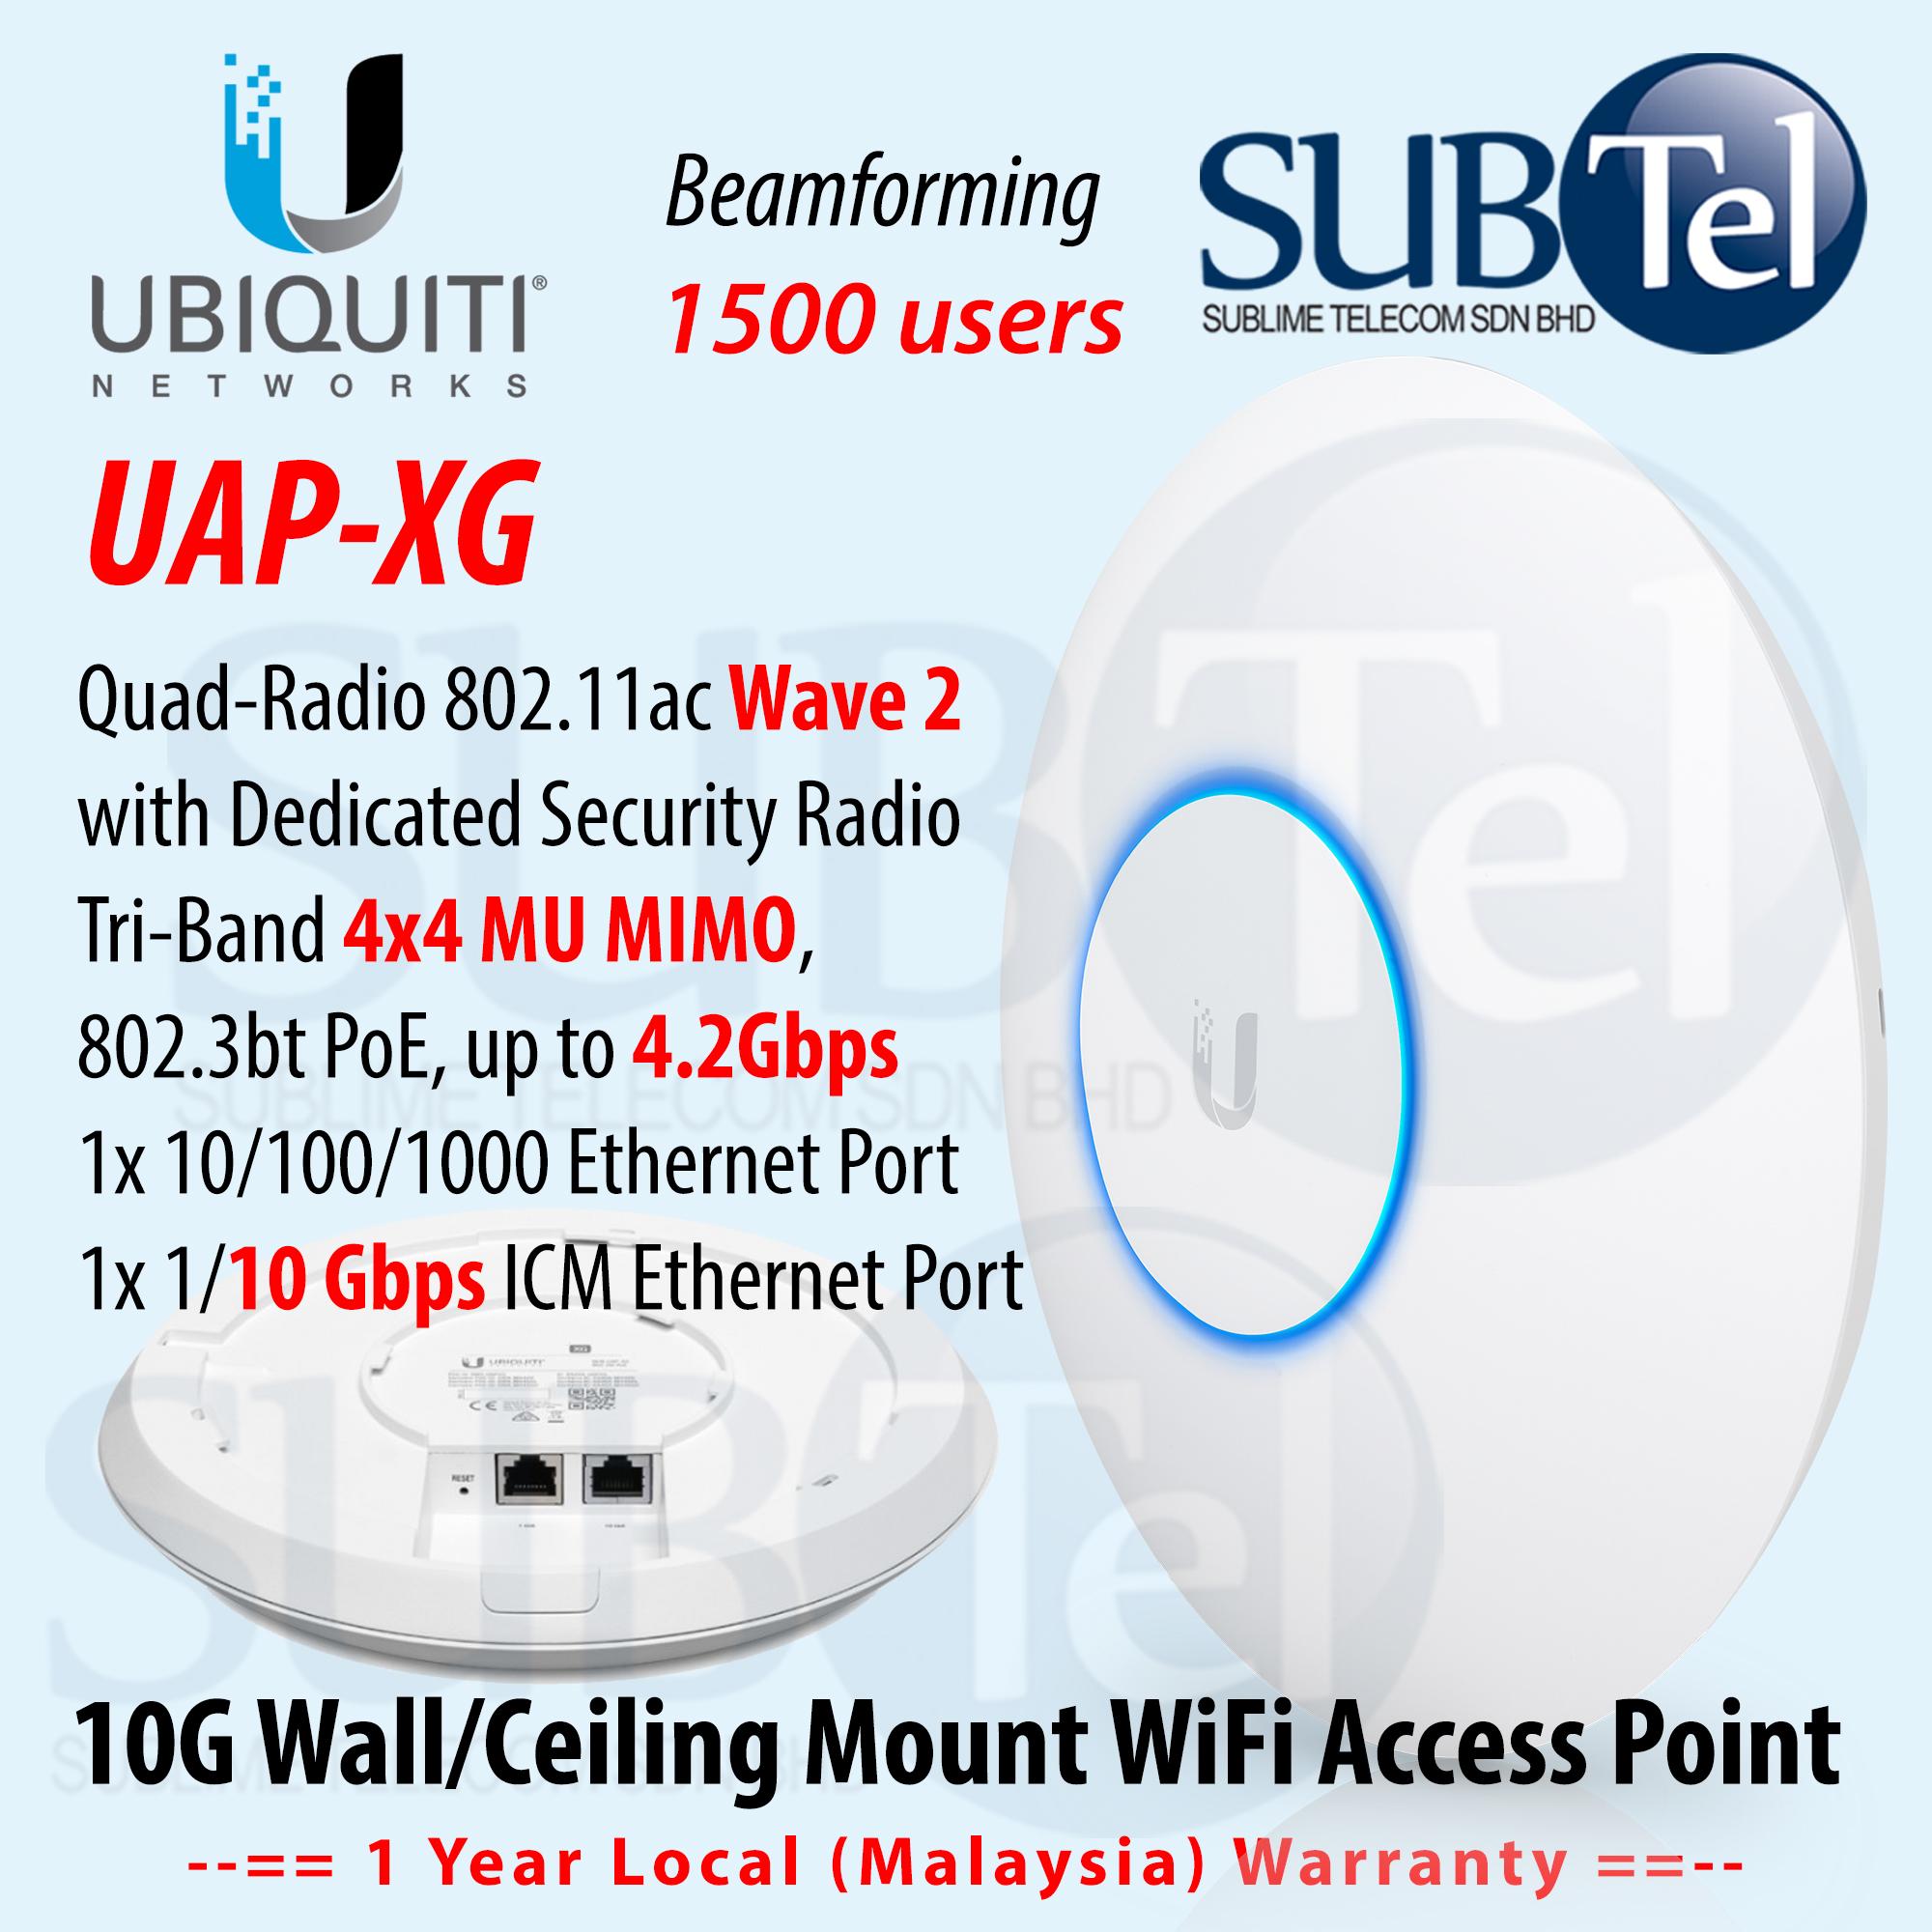 Ubiquiti UAP XG 802 11AC Wave 2 Quad-Radio WiFi AP with 10 Gigabit